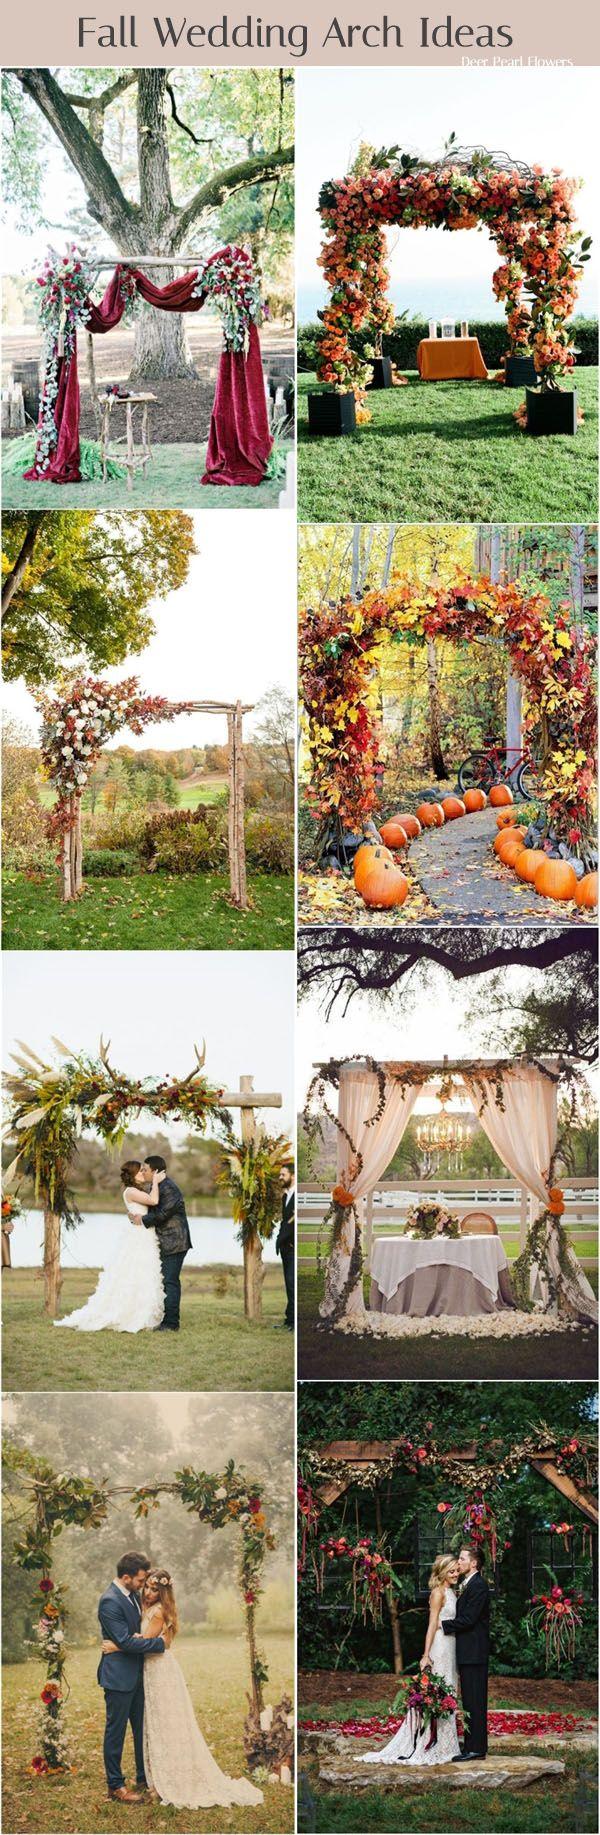 Fall wedding arch and alter decor ideas